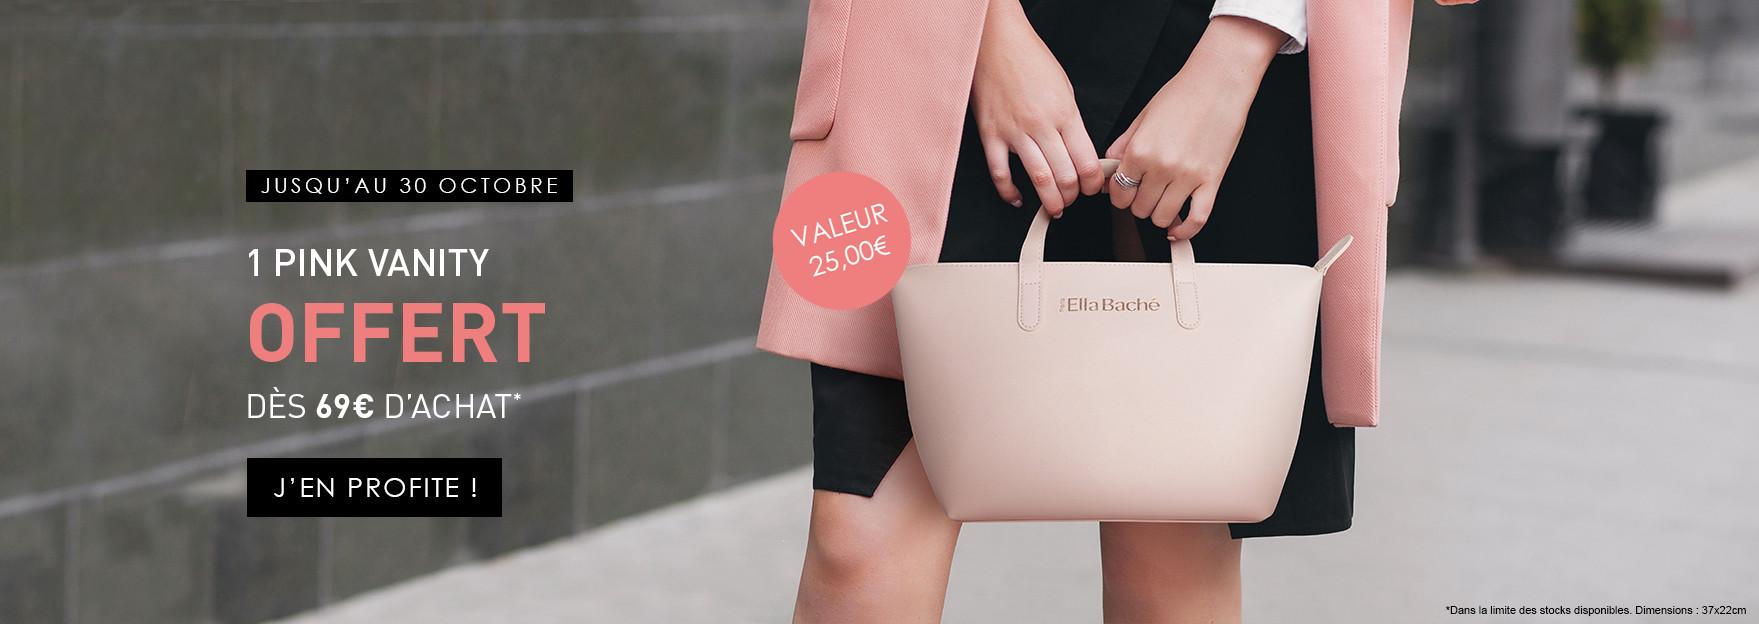 1 Pink Vanity OFFERT dès 69€ d'achat